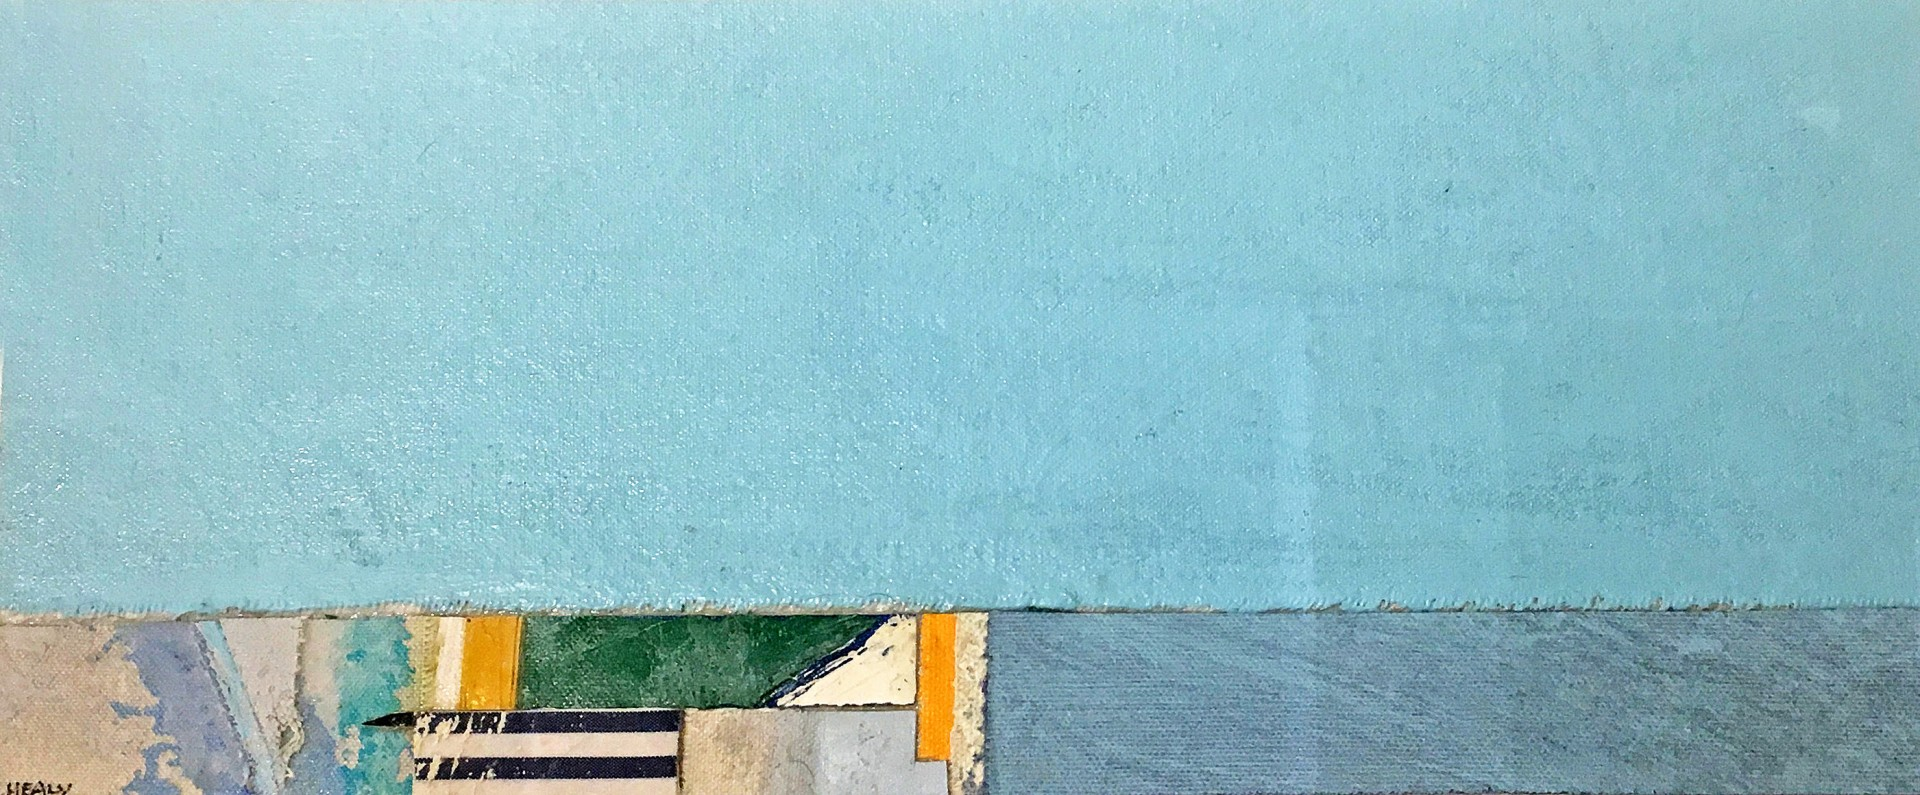 Madelyn Jordon Fine Art EUGENE HEALY: STEADY AS SHE GOES West Wharf